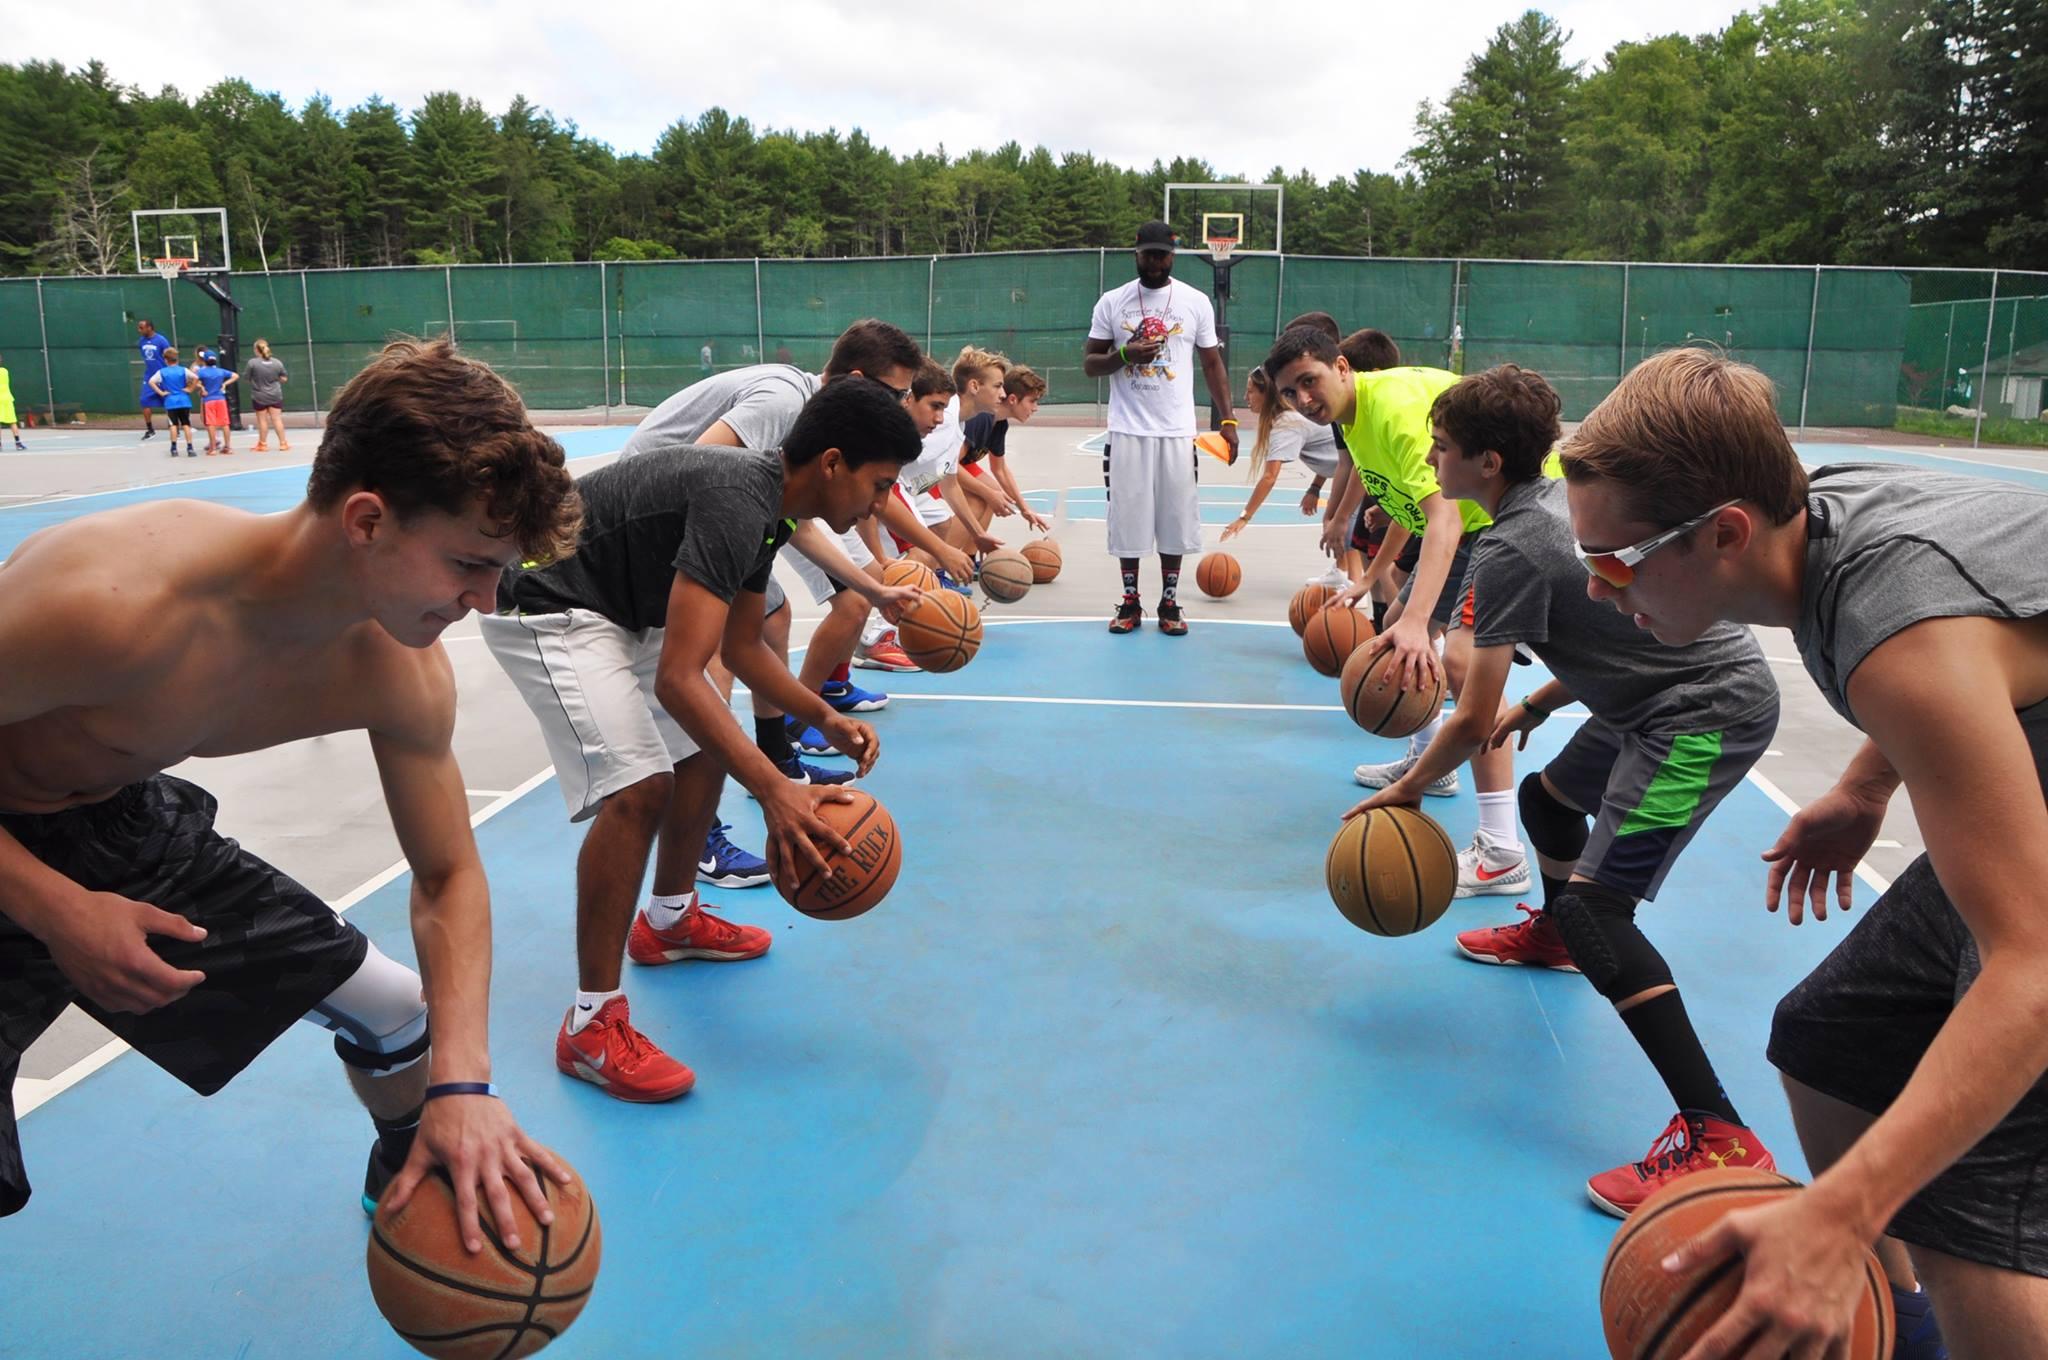 Summer Program - Flag Football | Kutsher's Sports Academy